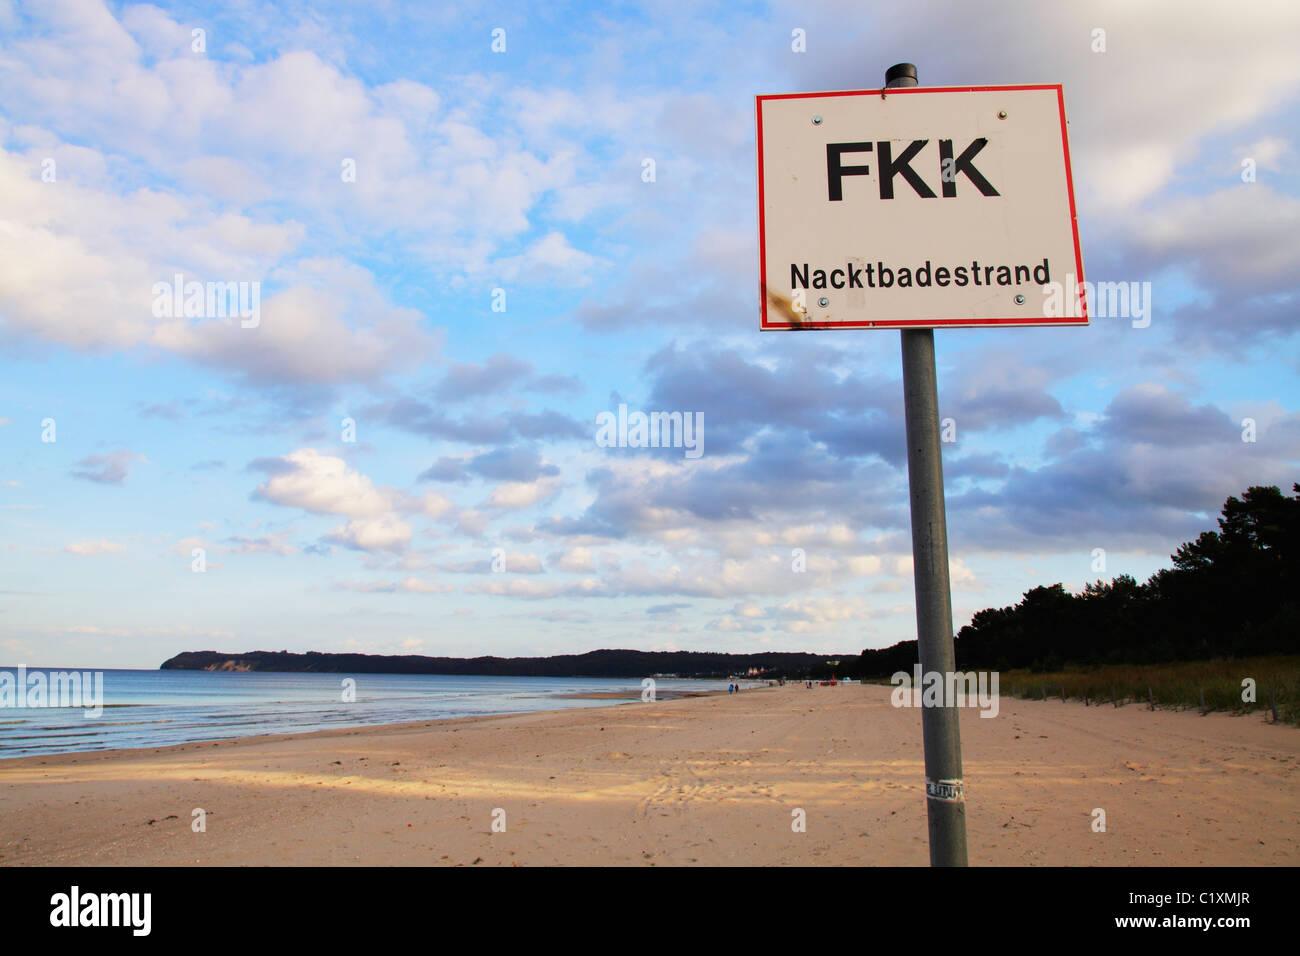 Germany, Sign FKK At Beach Stock Photo - Image: 58258315